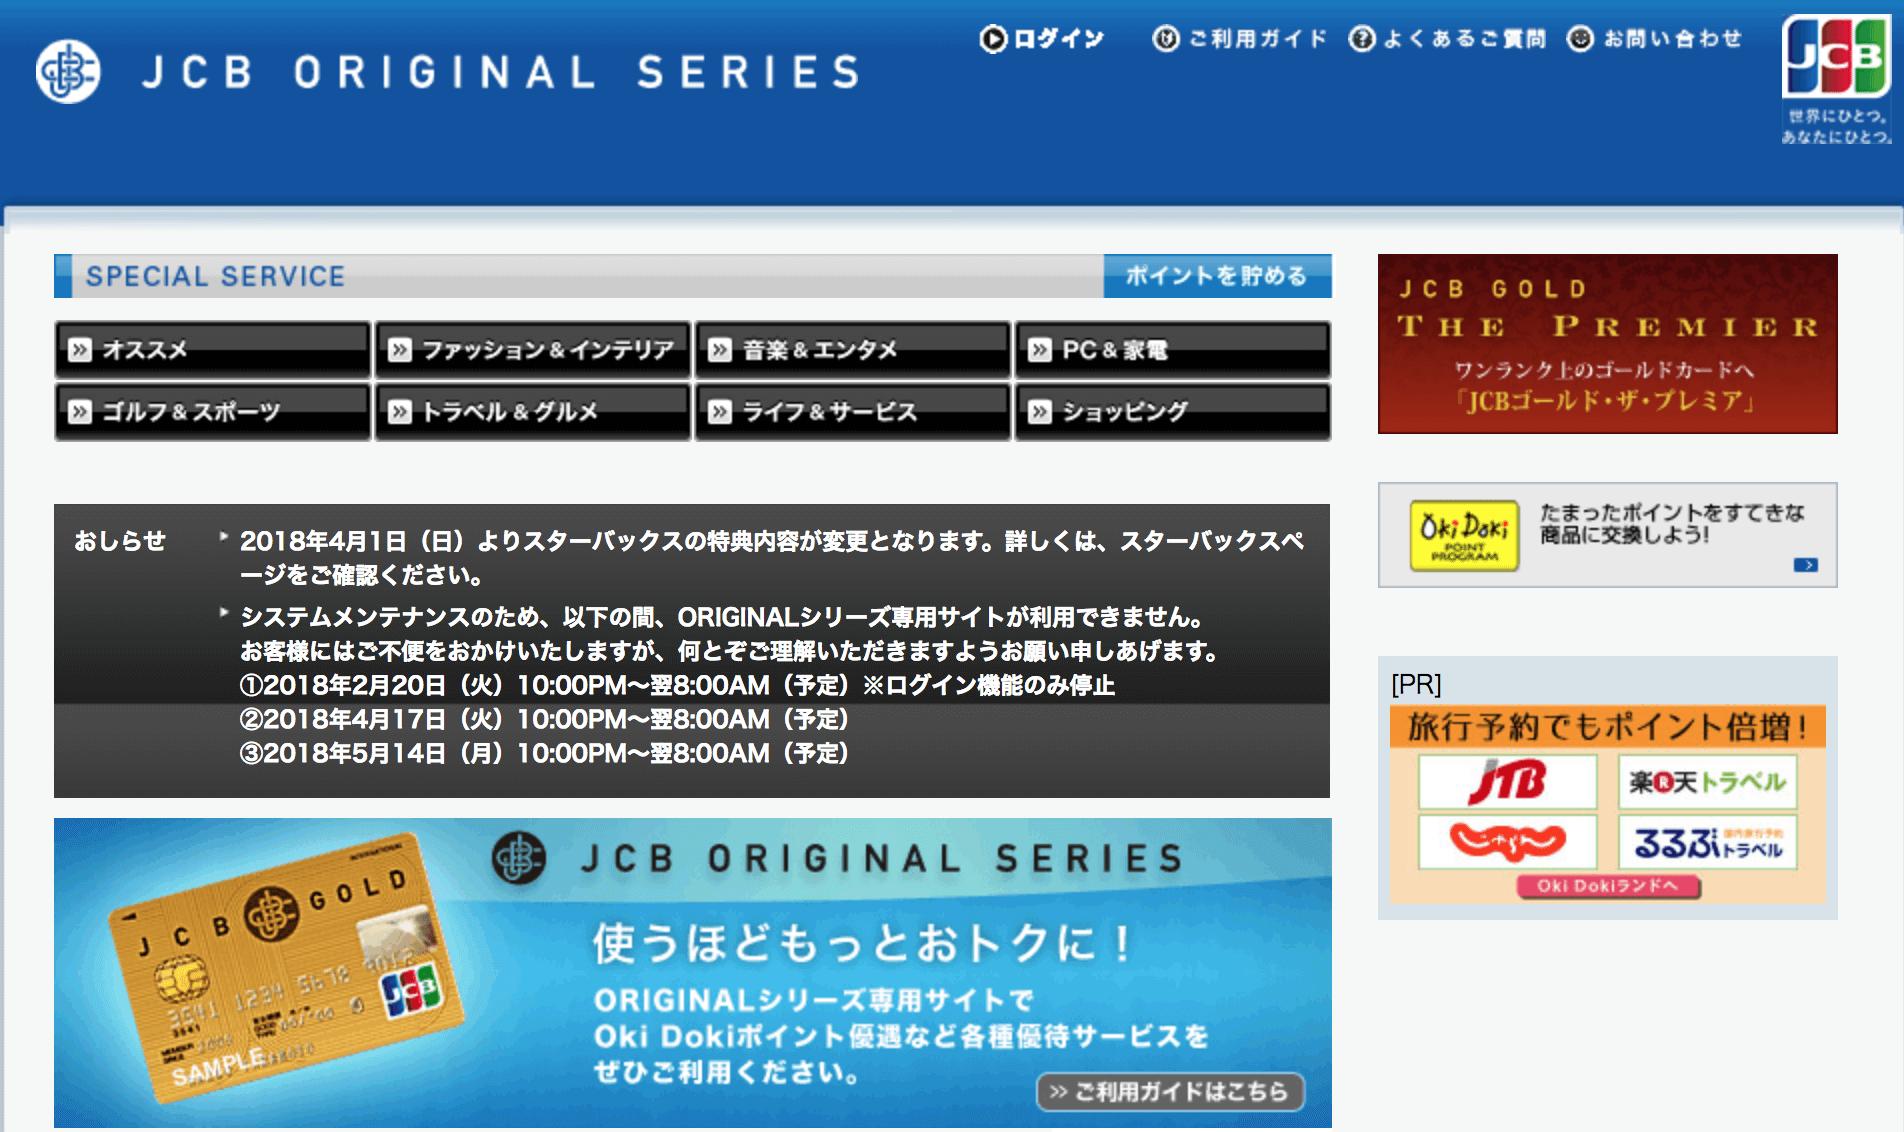 JCB ORIGINAL SERIES